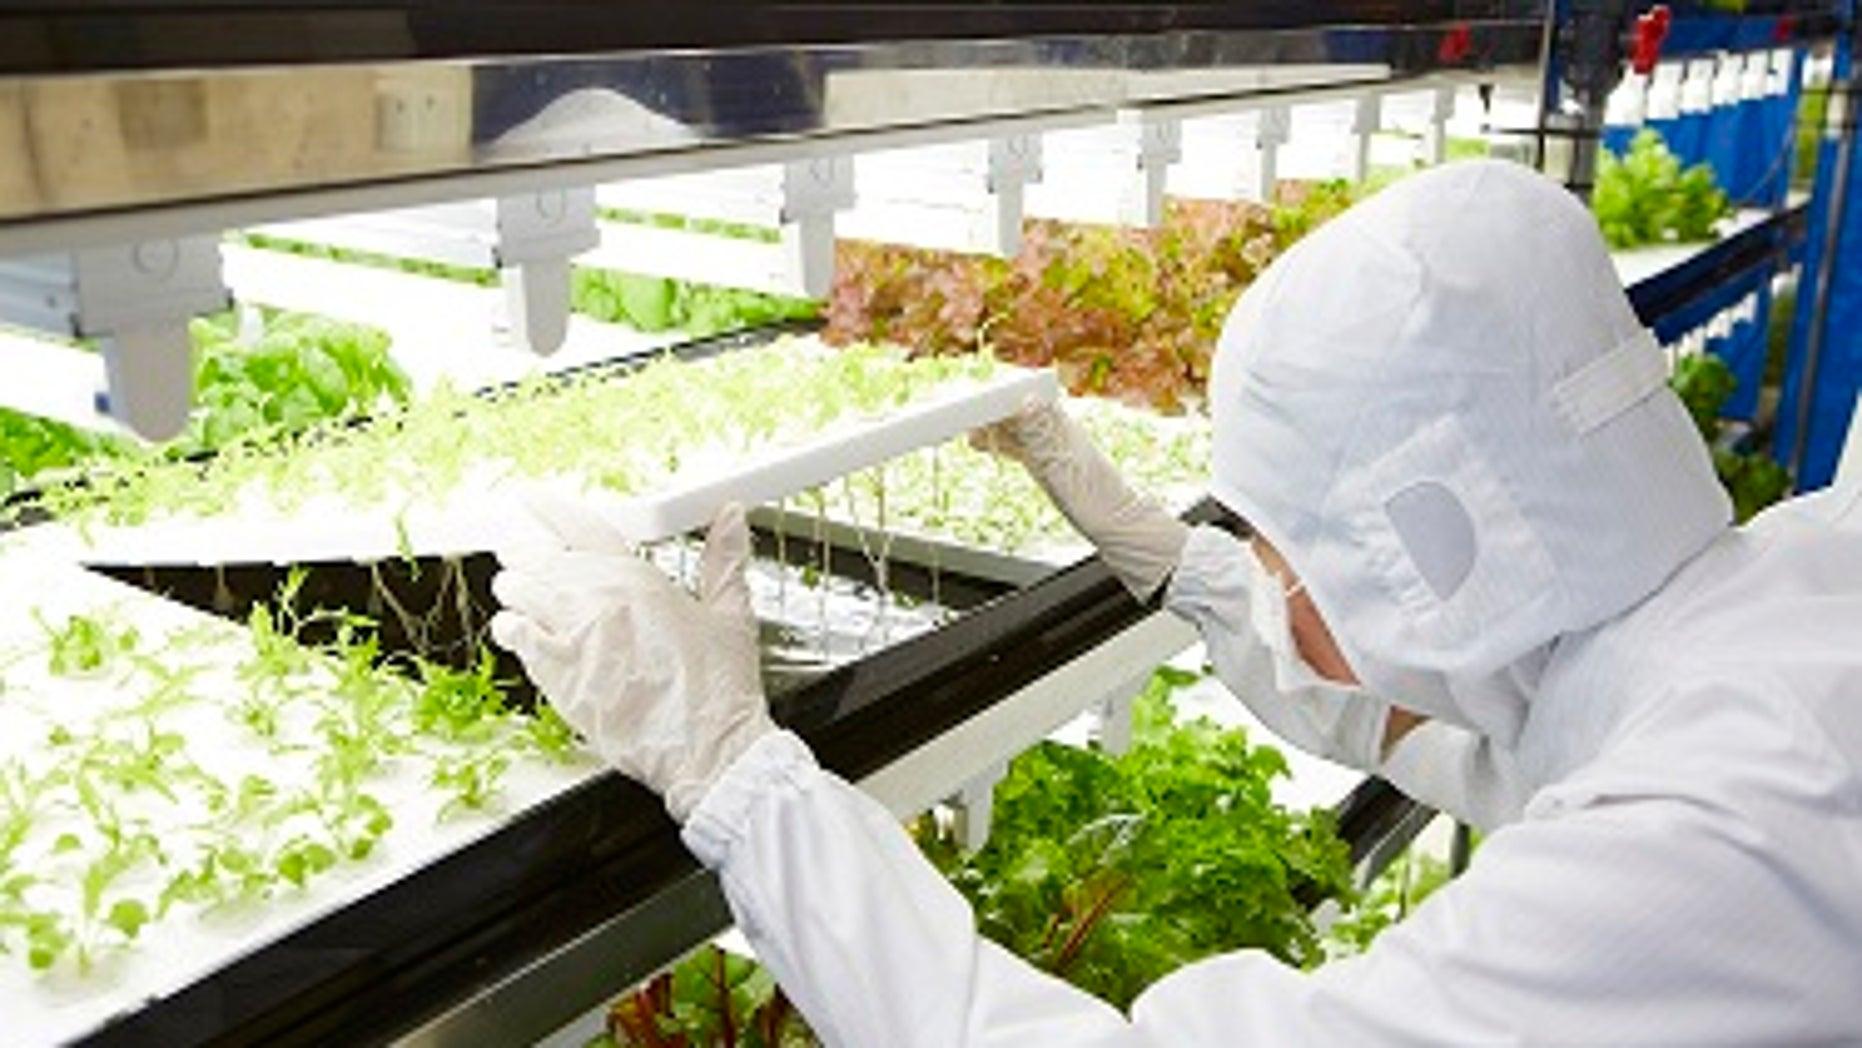 A scientist examines baby lettuces growing.